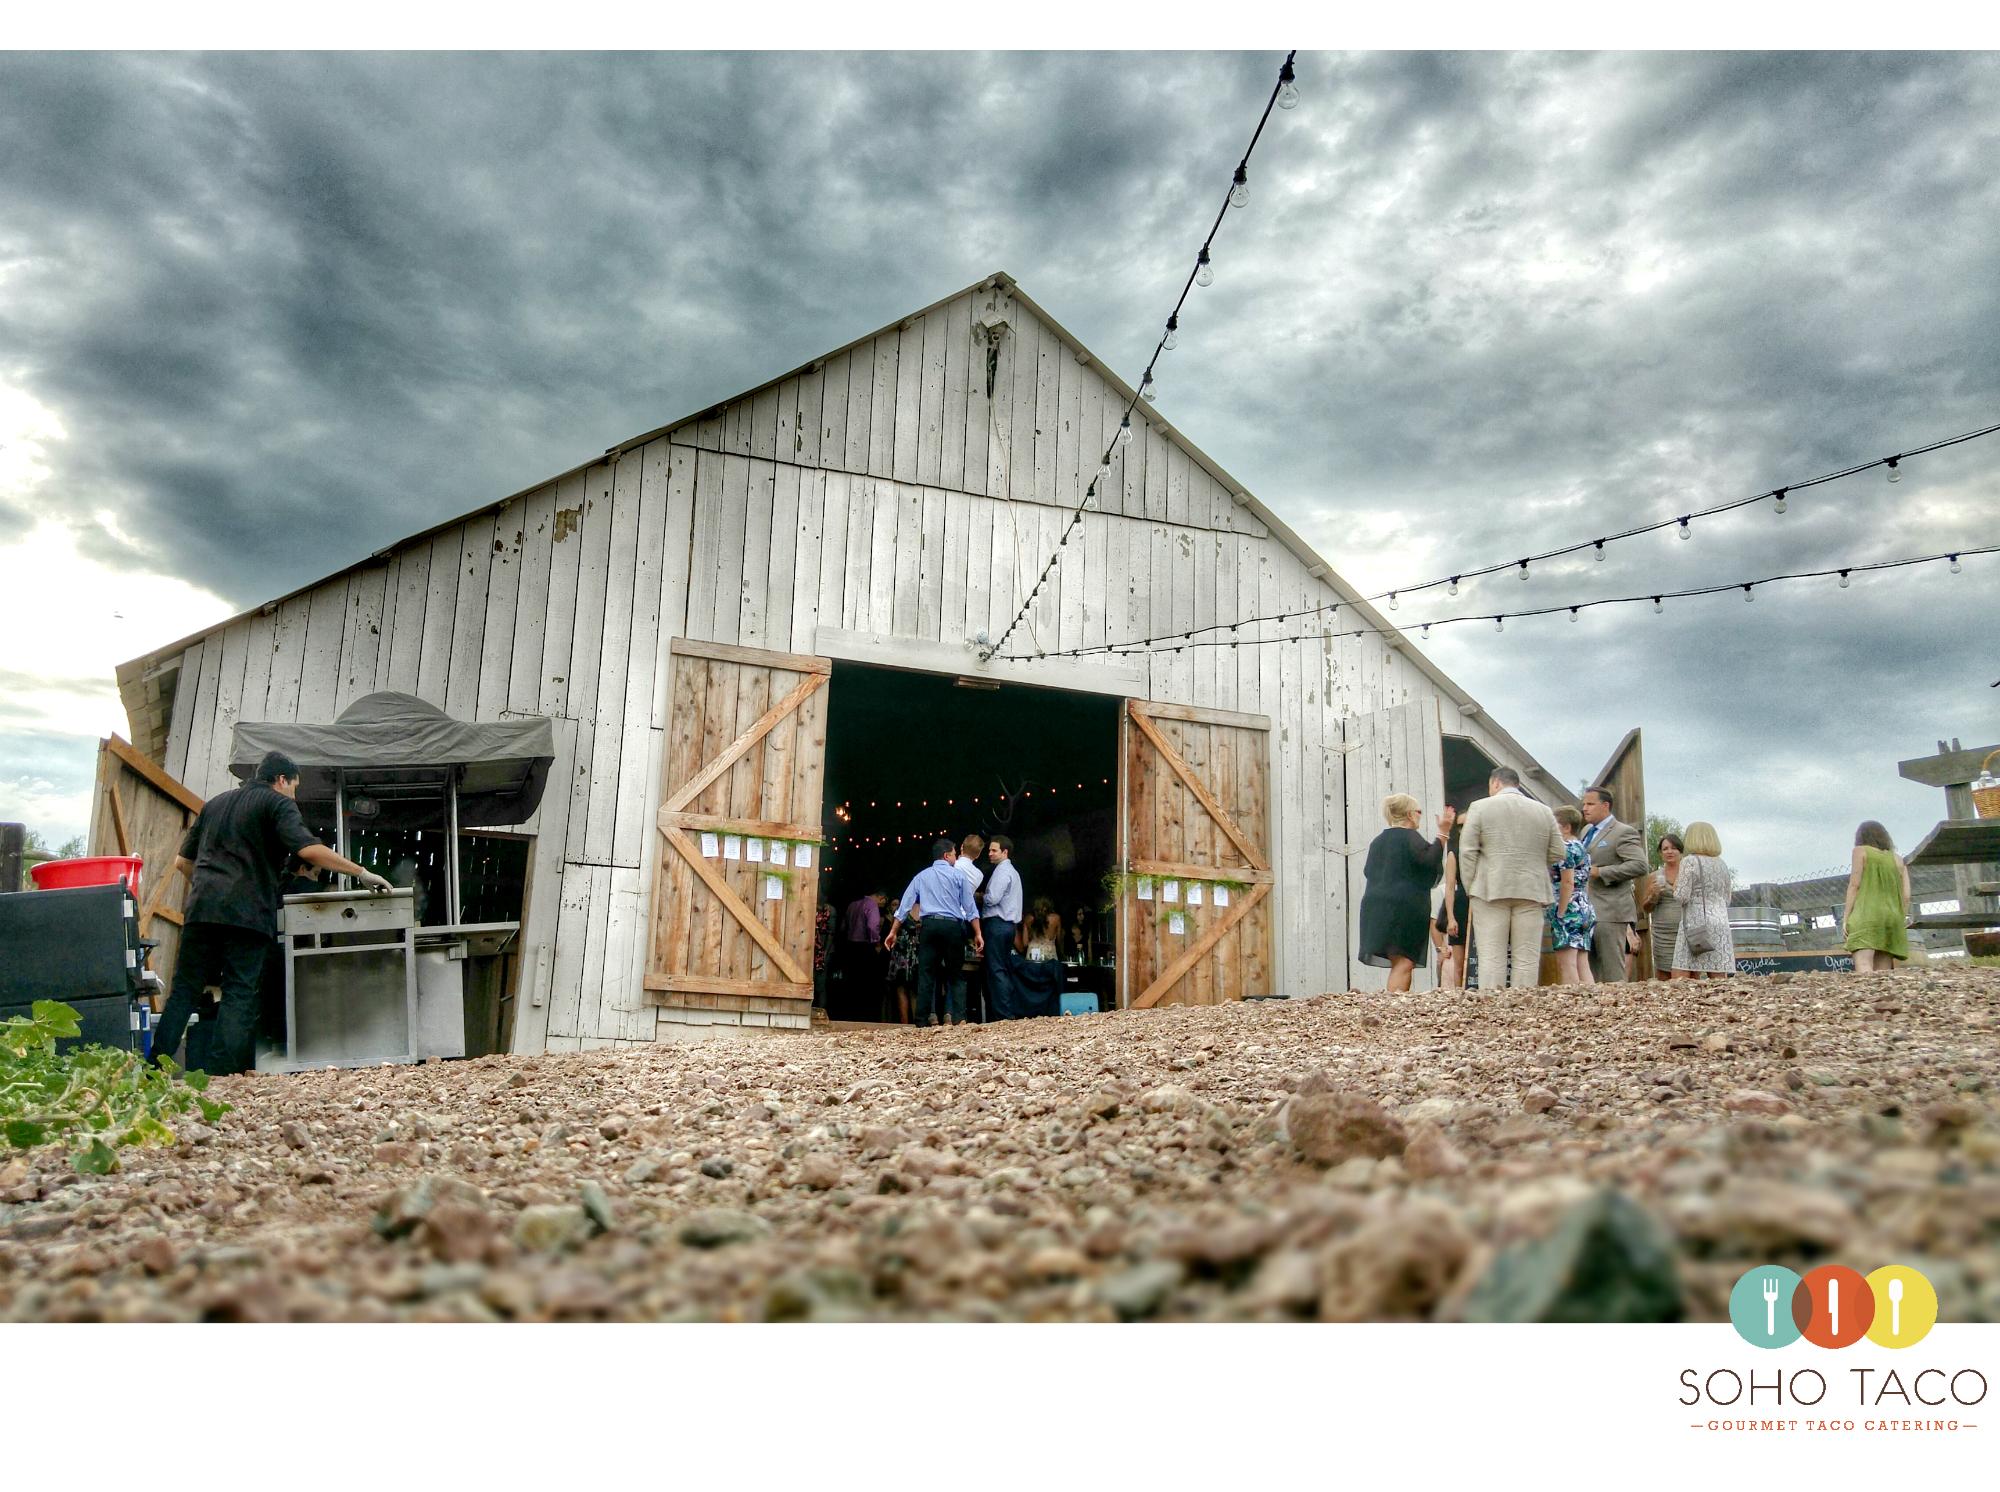 SOHO TACO Gourmet Taco Catering - San Luis Obispo - Spreafico Farms - Wedding - SLO